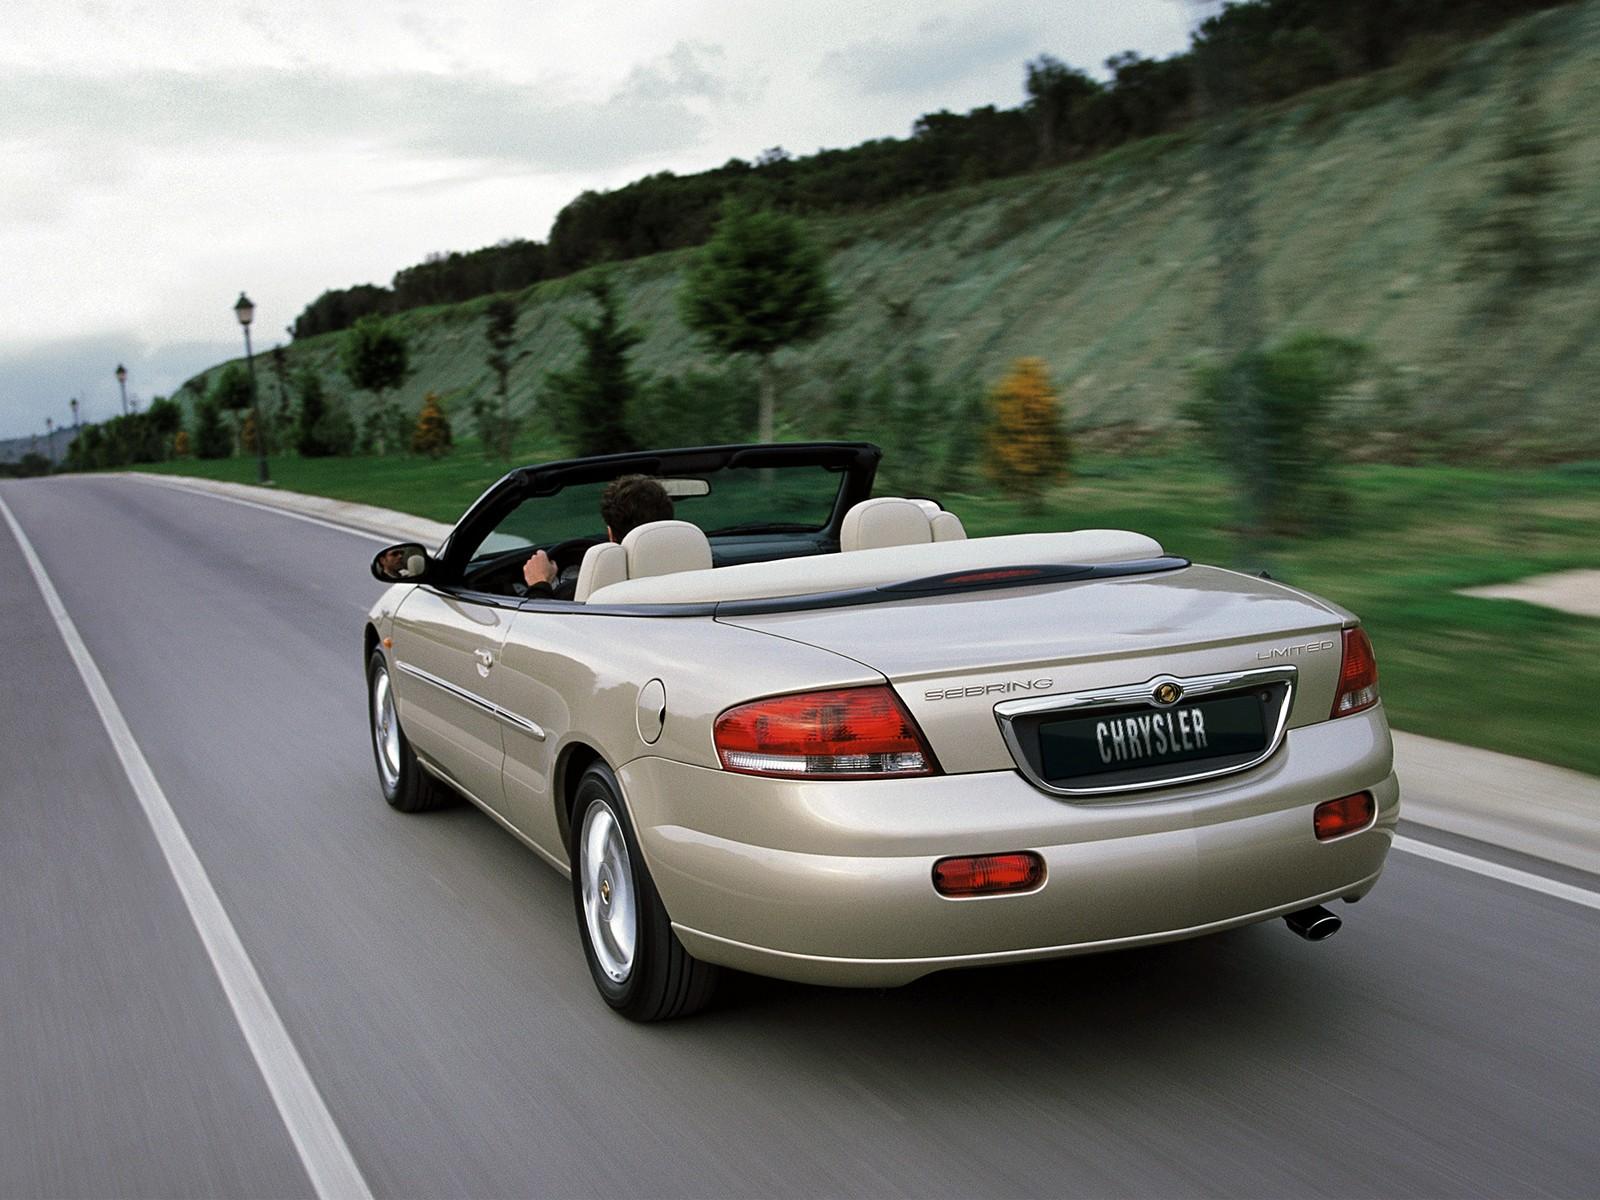 Chrysler Grand Voyager also C A besides Chrysler Sebring Convertible further C together with Maxresdefault. on 2001 chrysler sebring engine